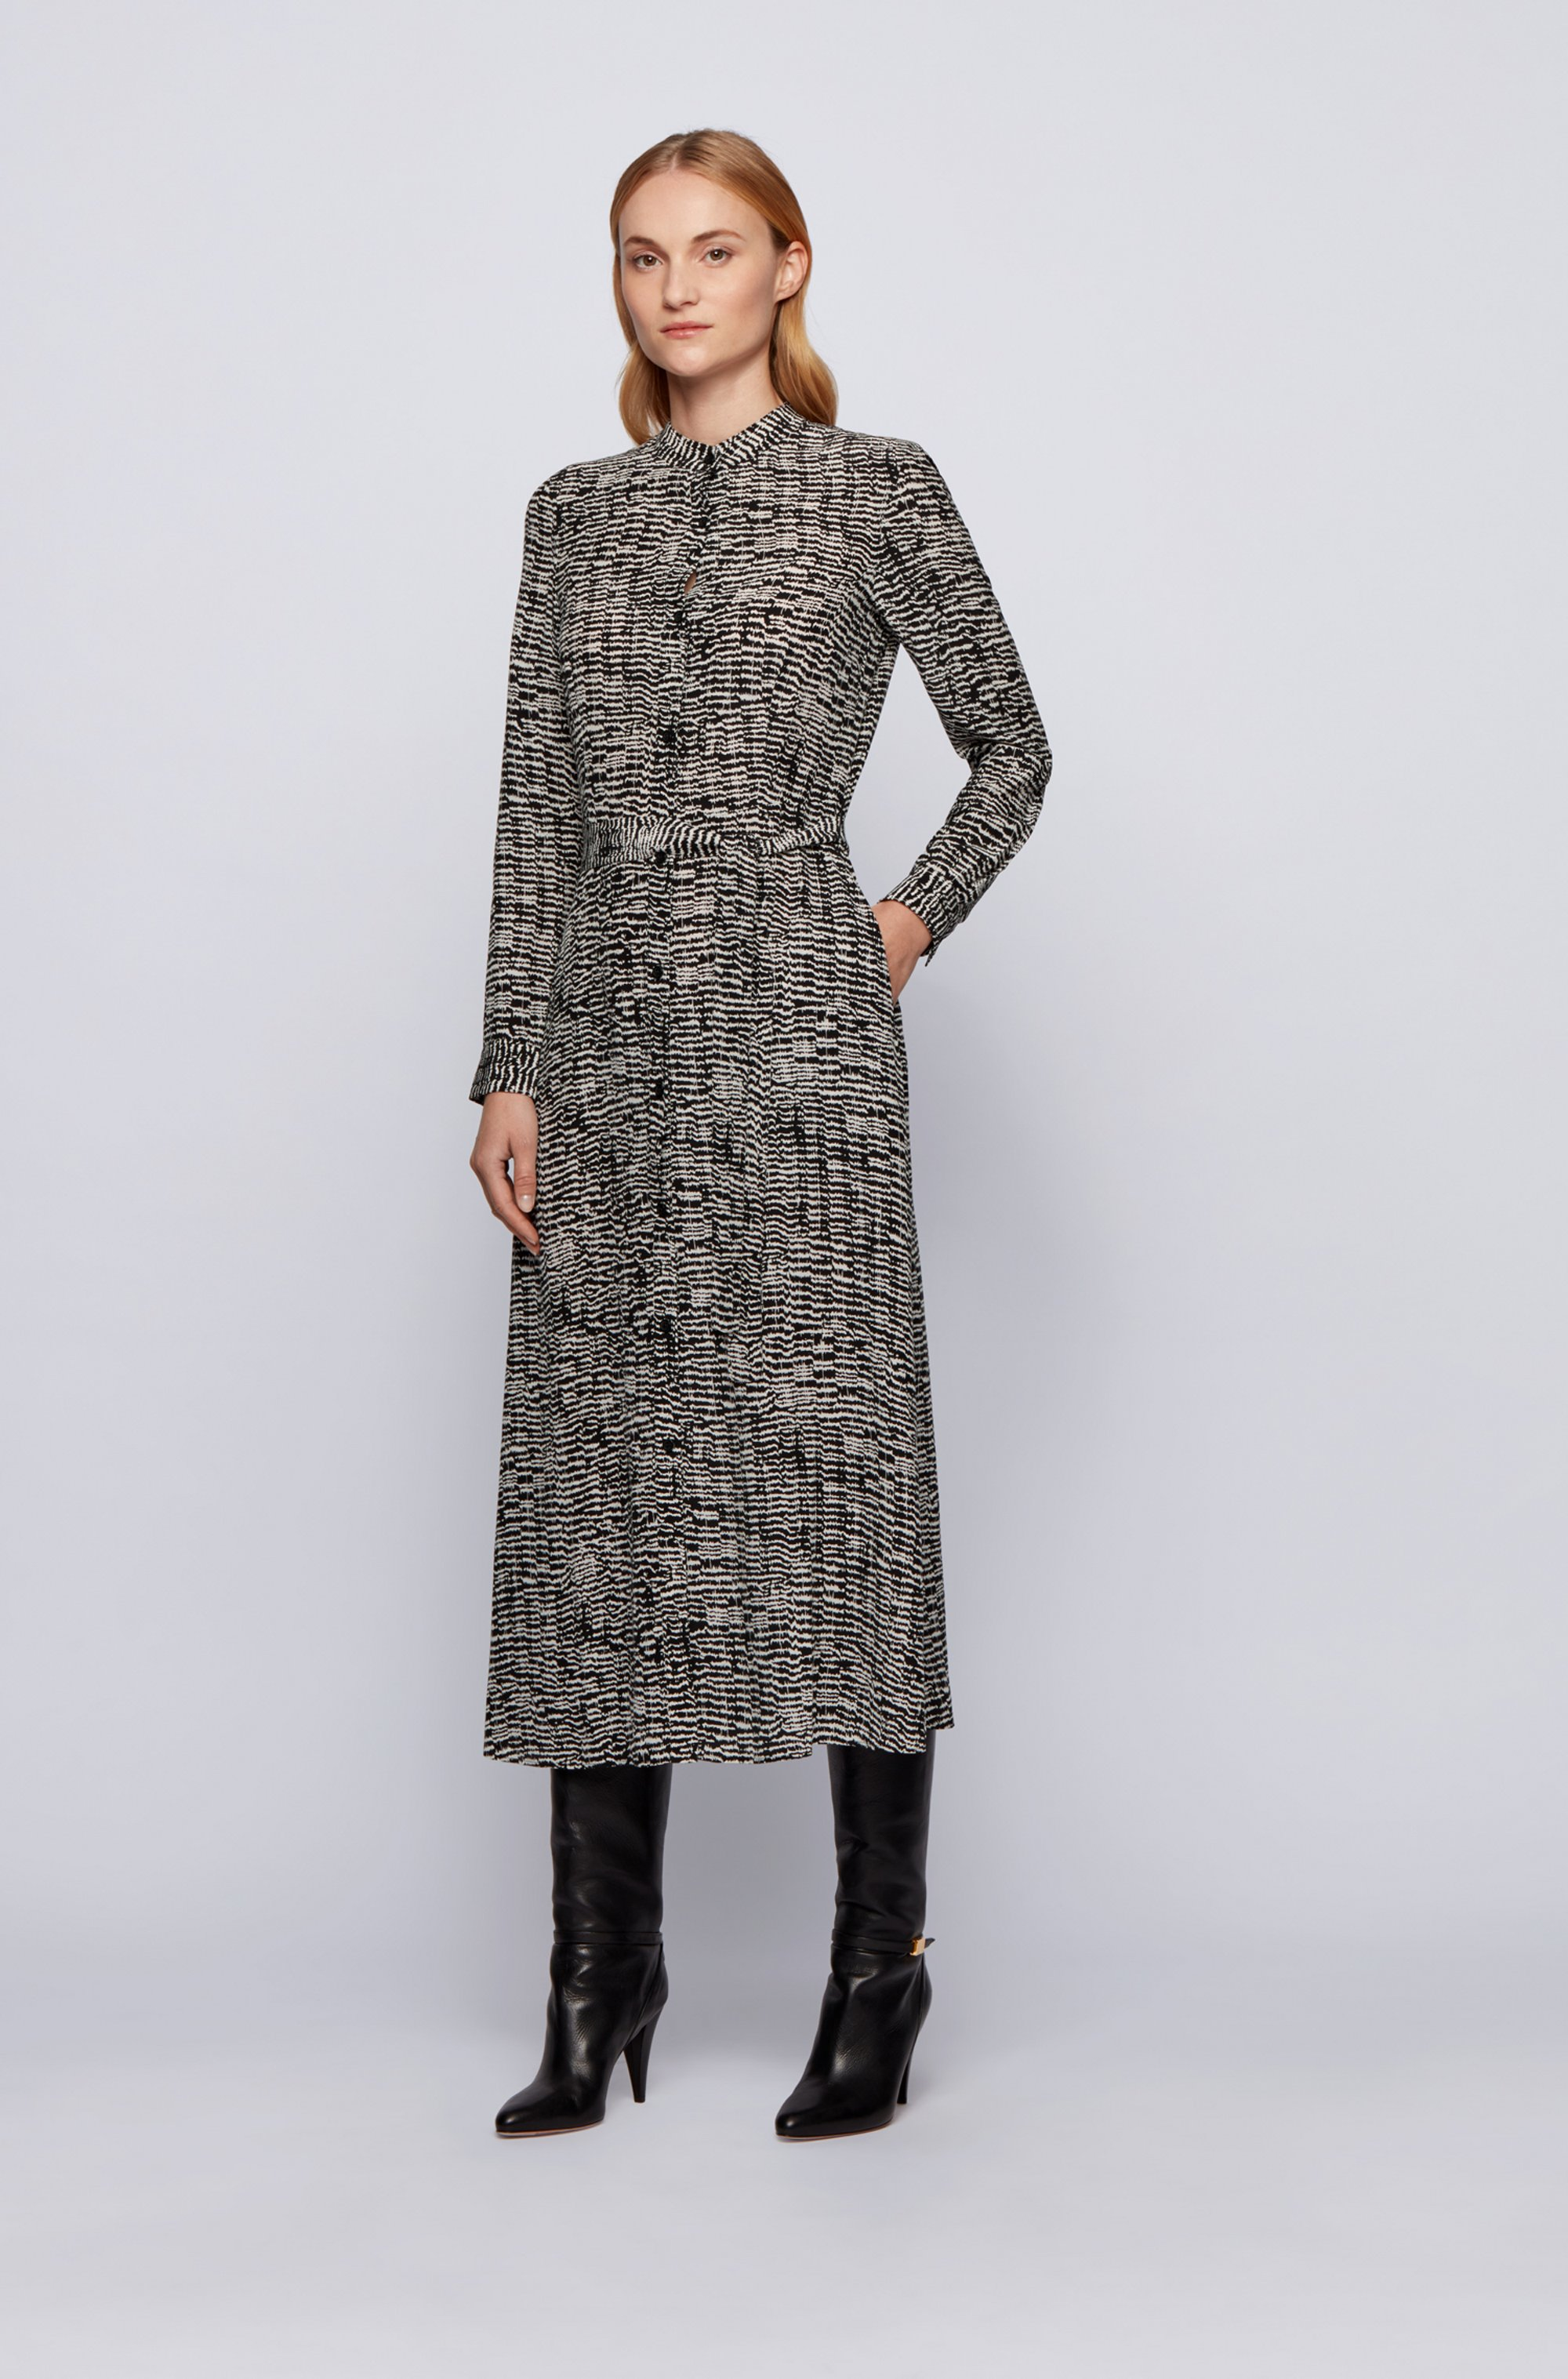 Long-length shirt dress with zebra-inspired print